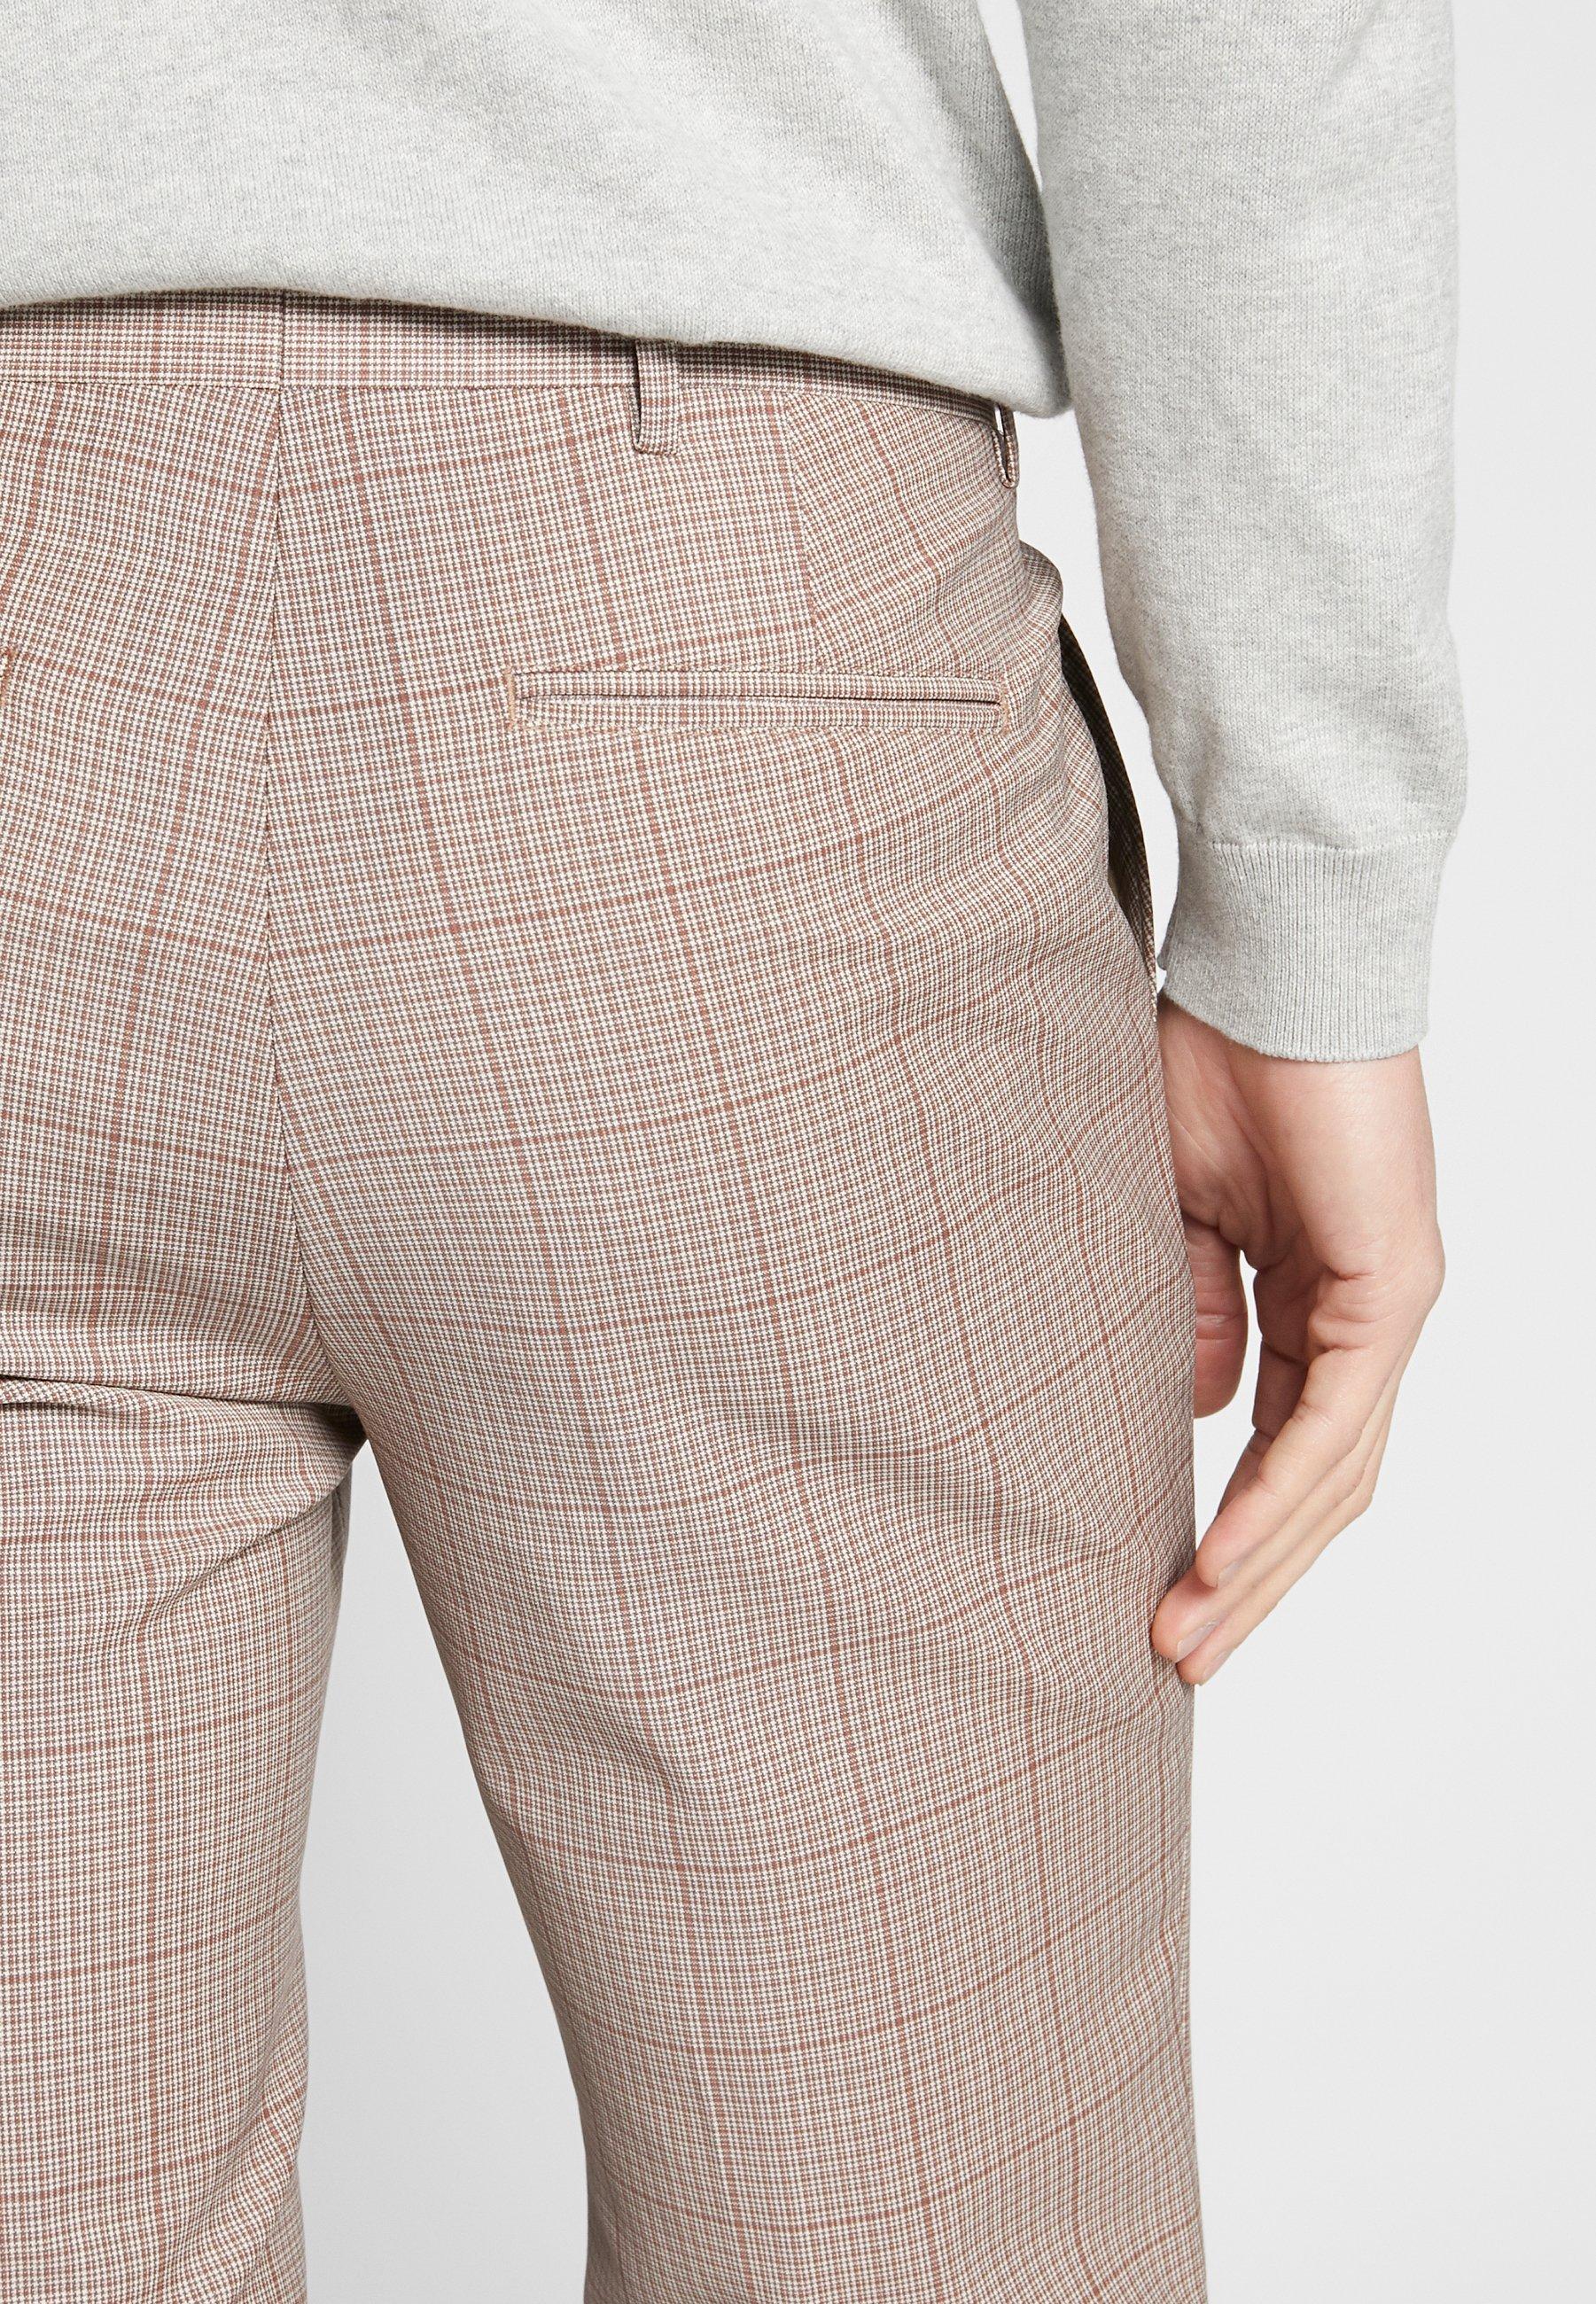 Bertoni RAVN TROUSERS Bukse beige Zalando.no